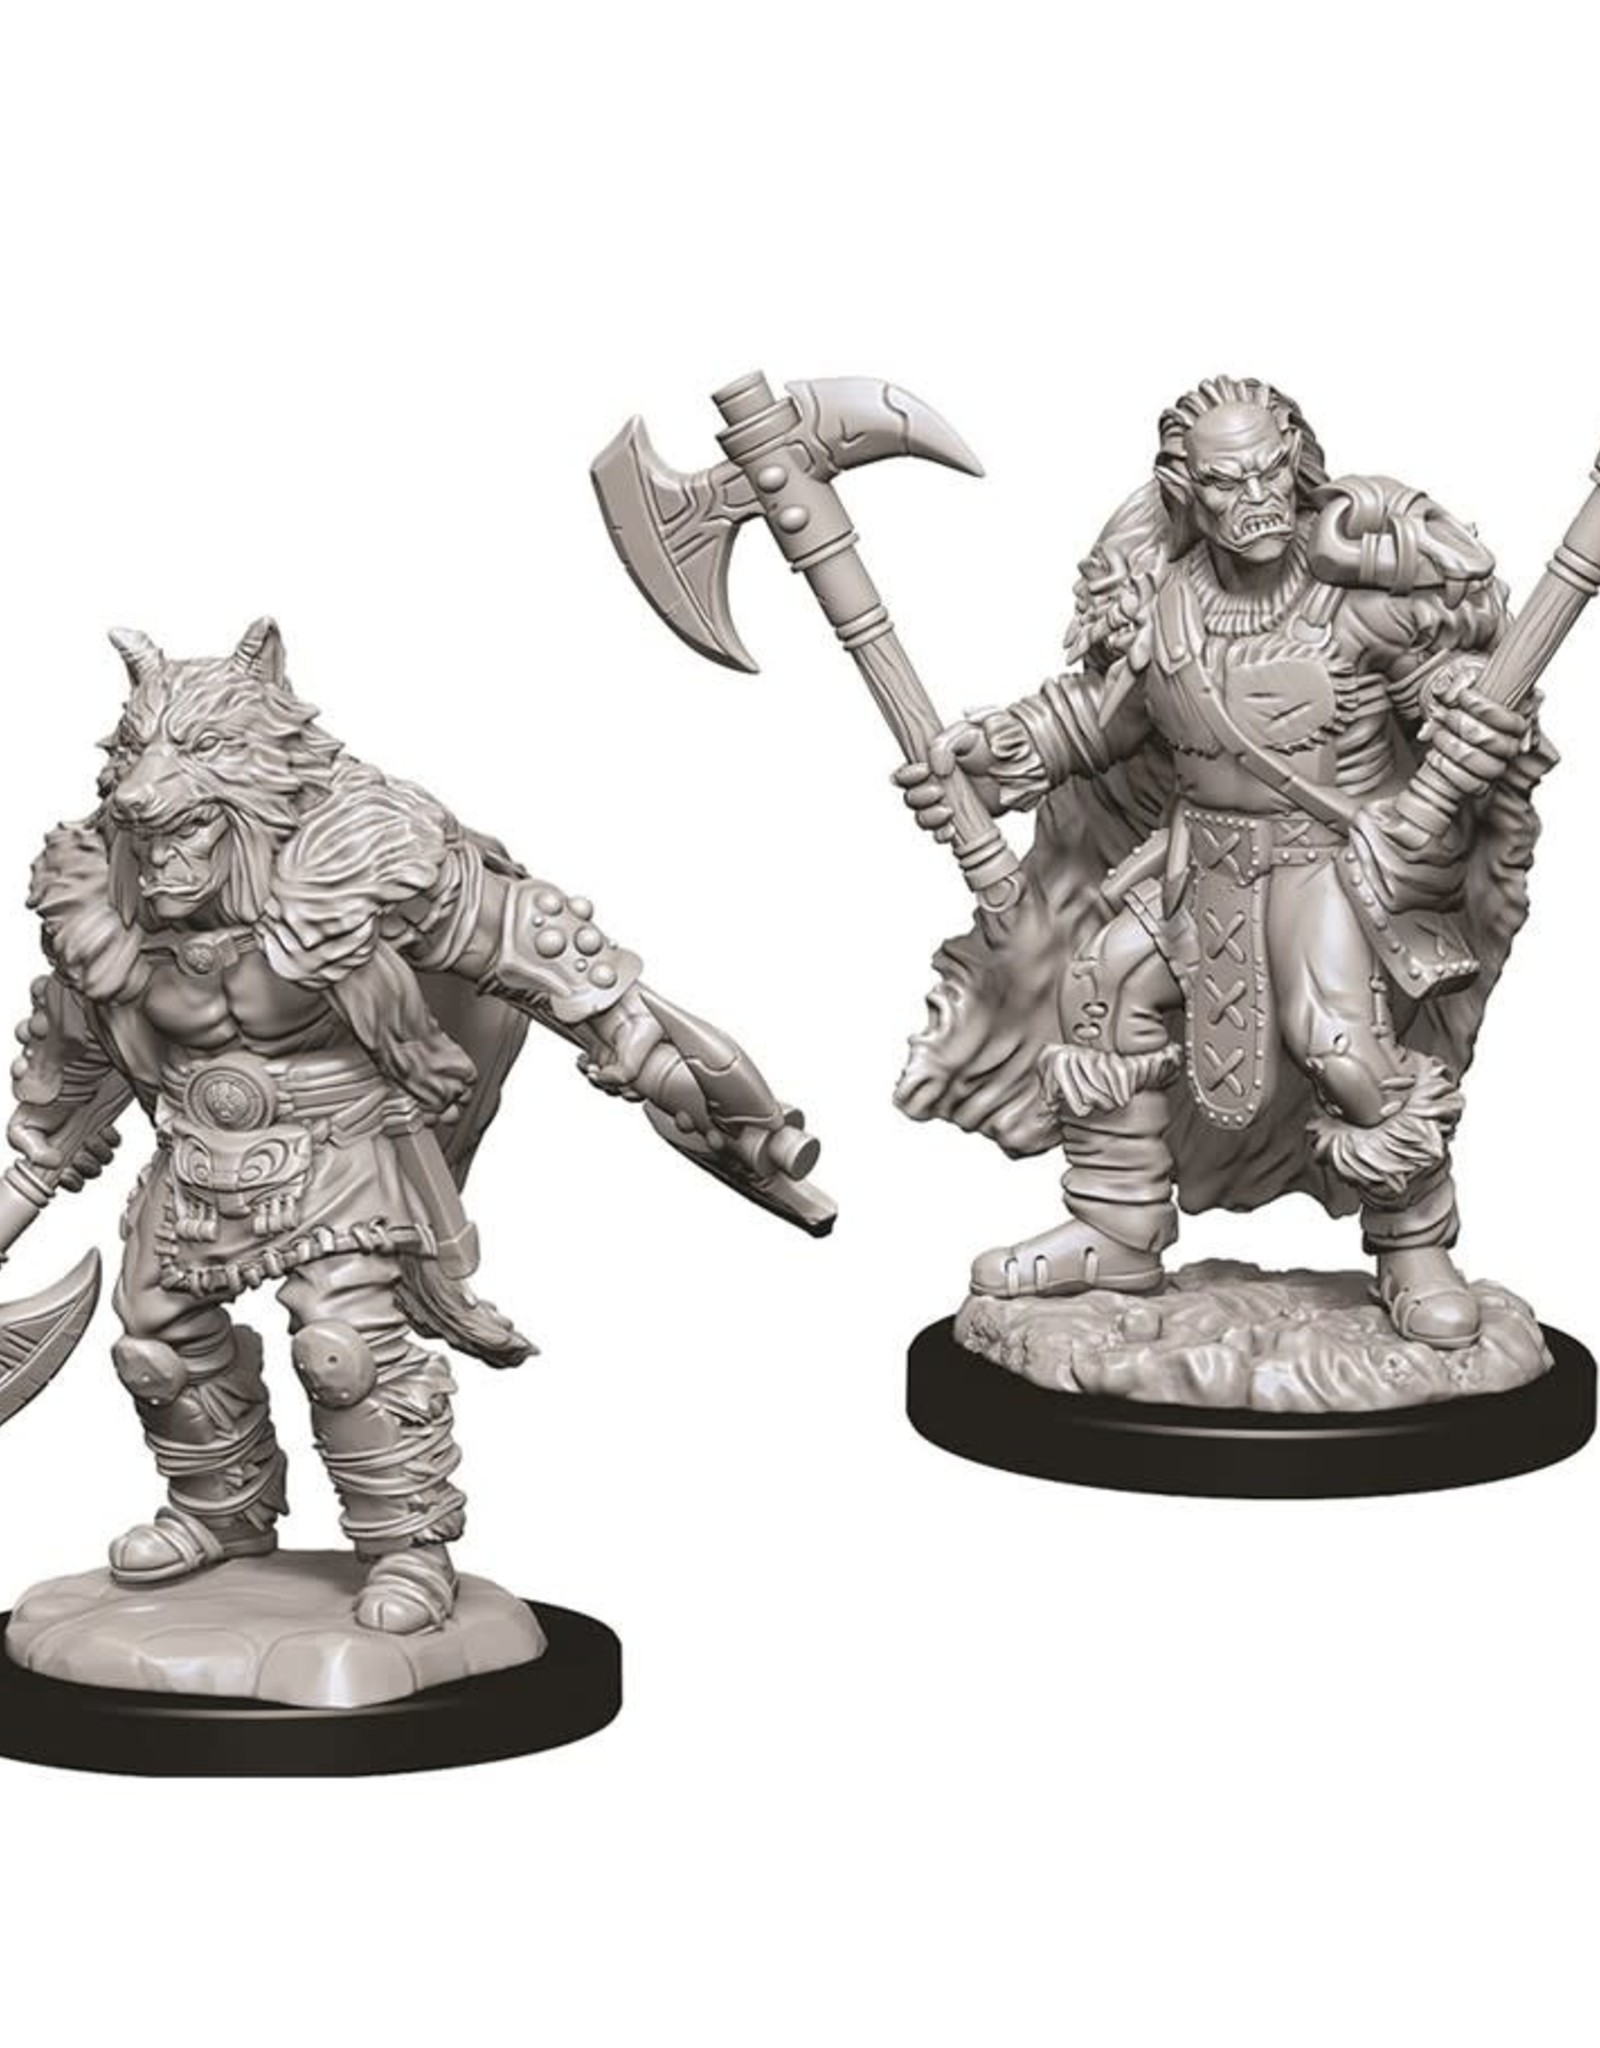 Wizkids D&D Unpainted Minis: Half-Orc Barbarian Male